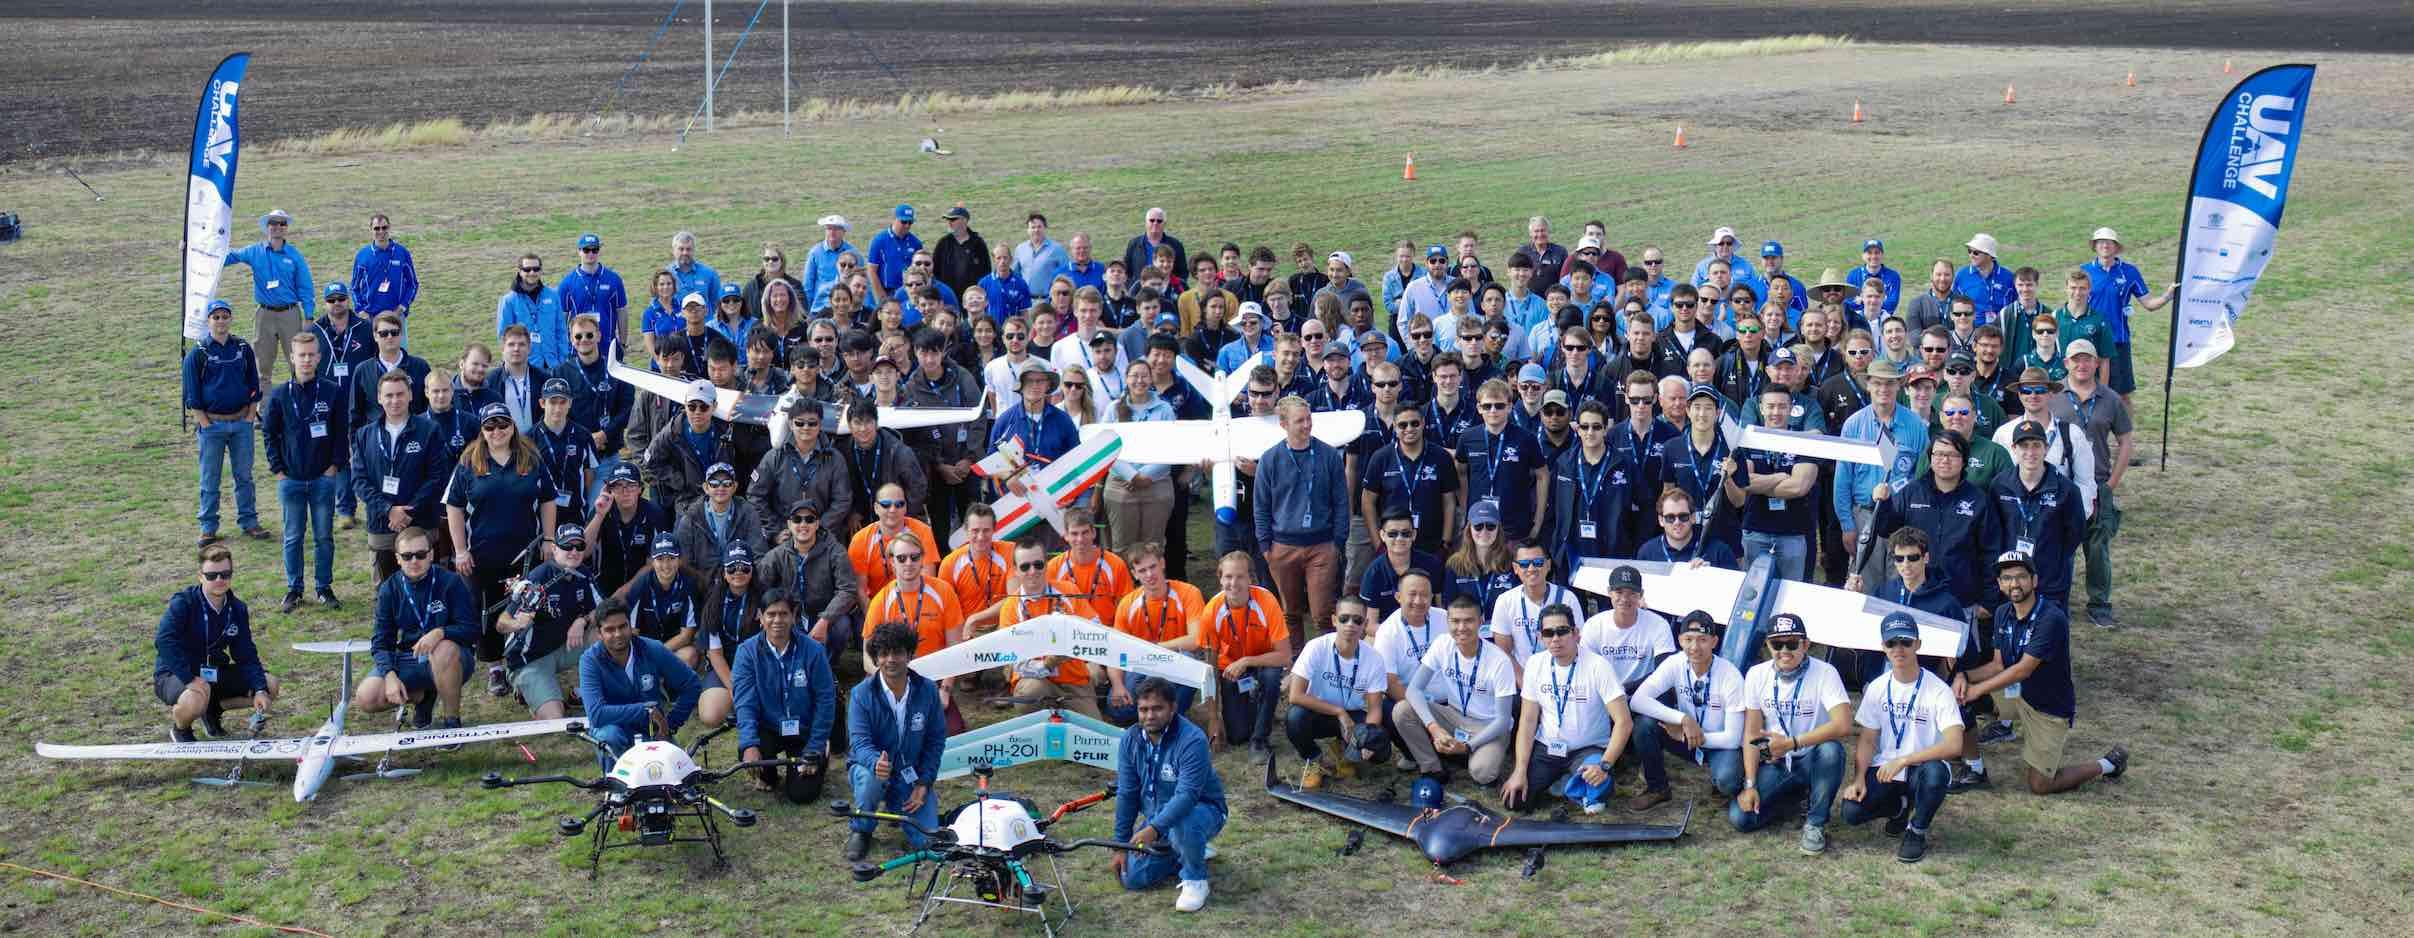 About – UAV Challenge